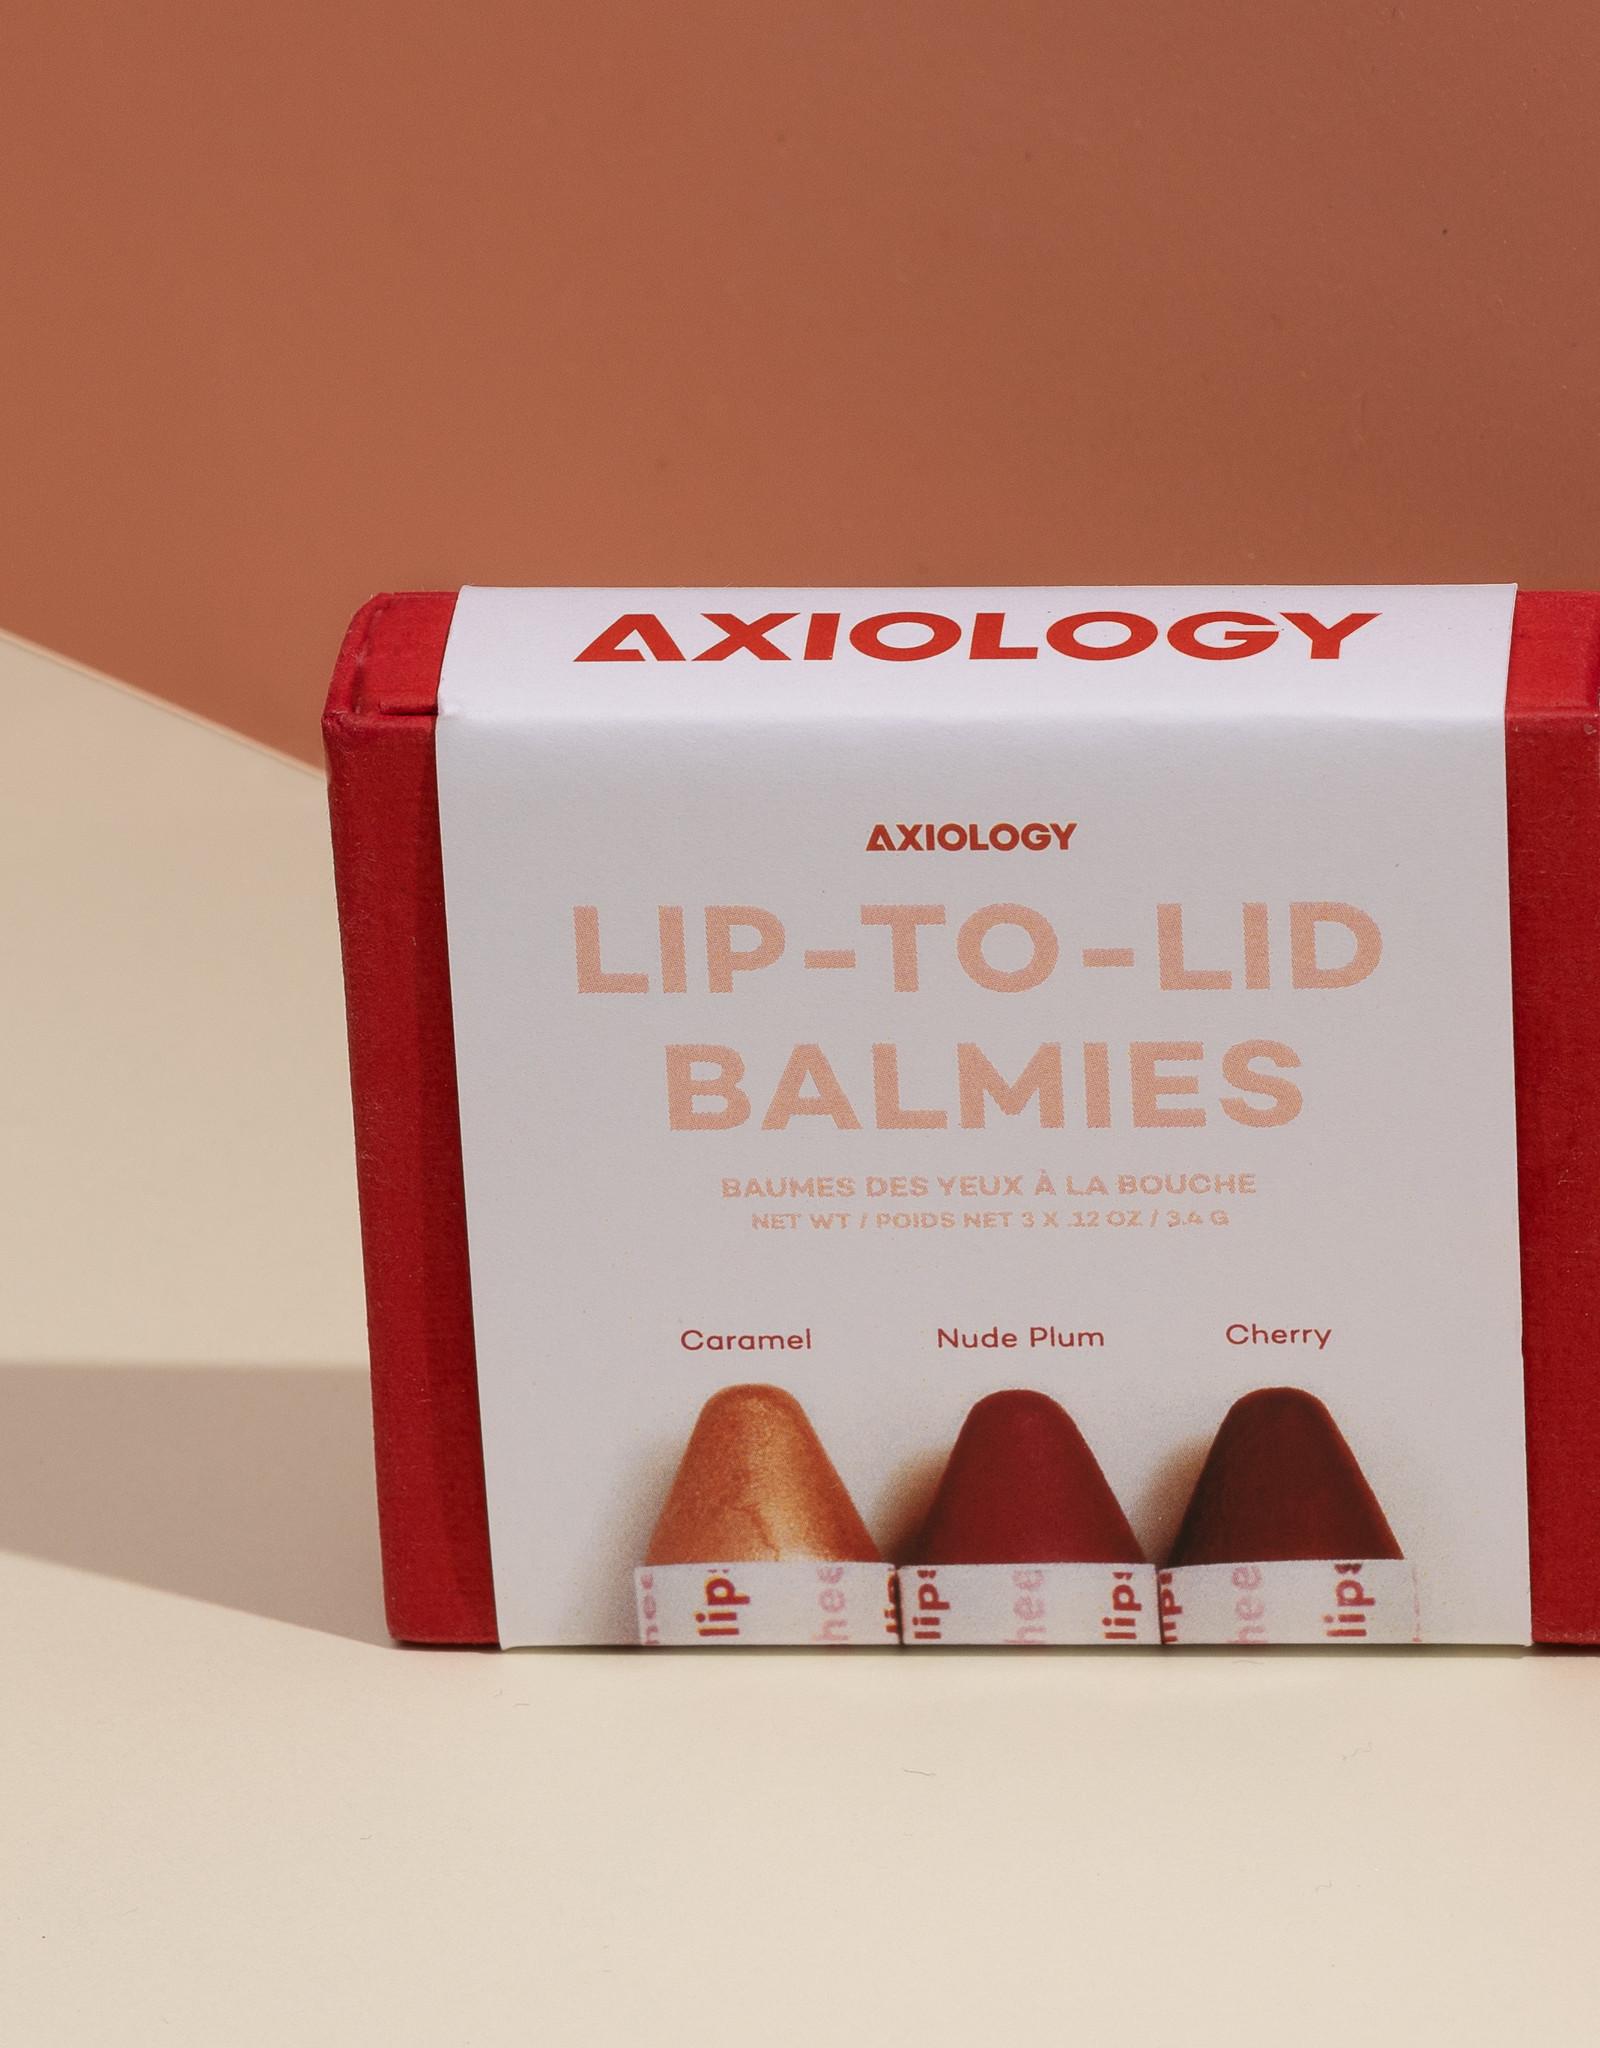 Axiology Make up balmies: Of The Earth